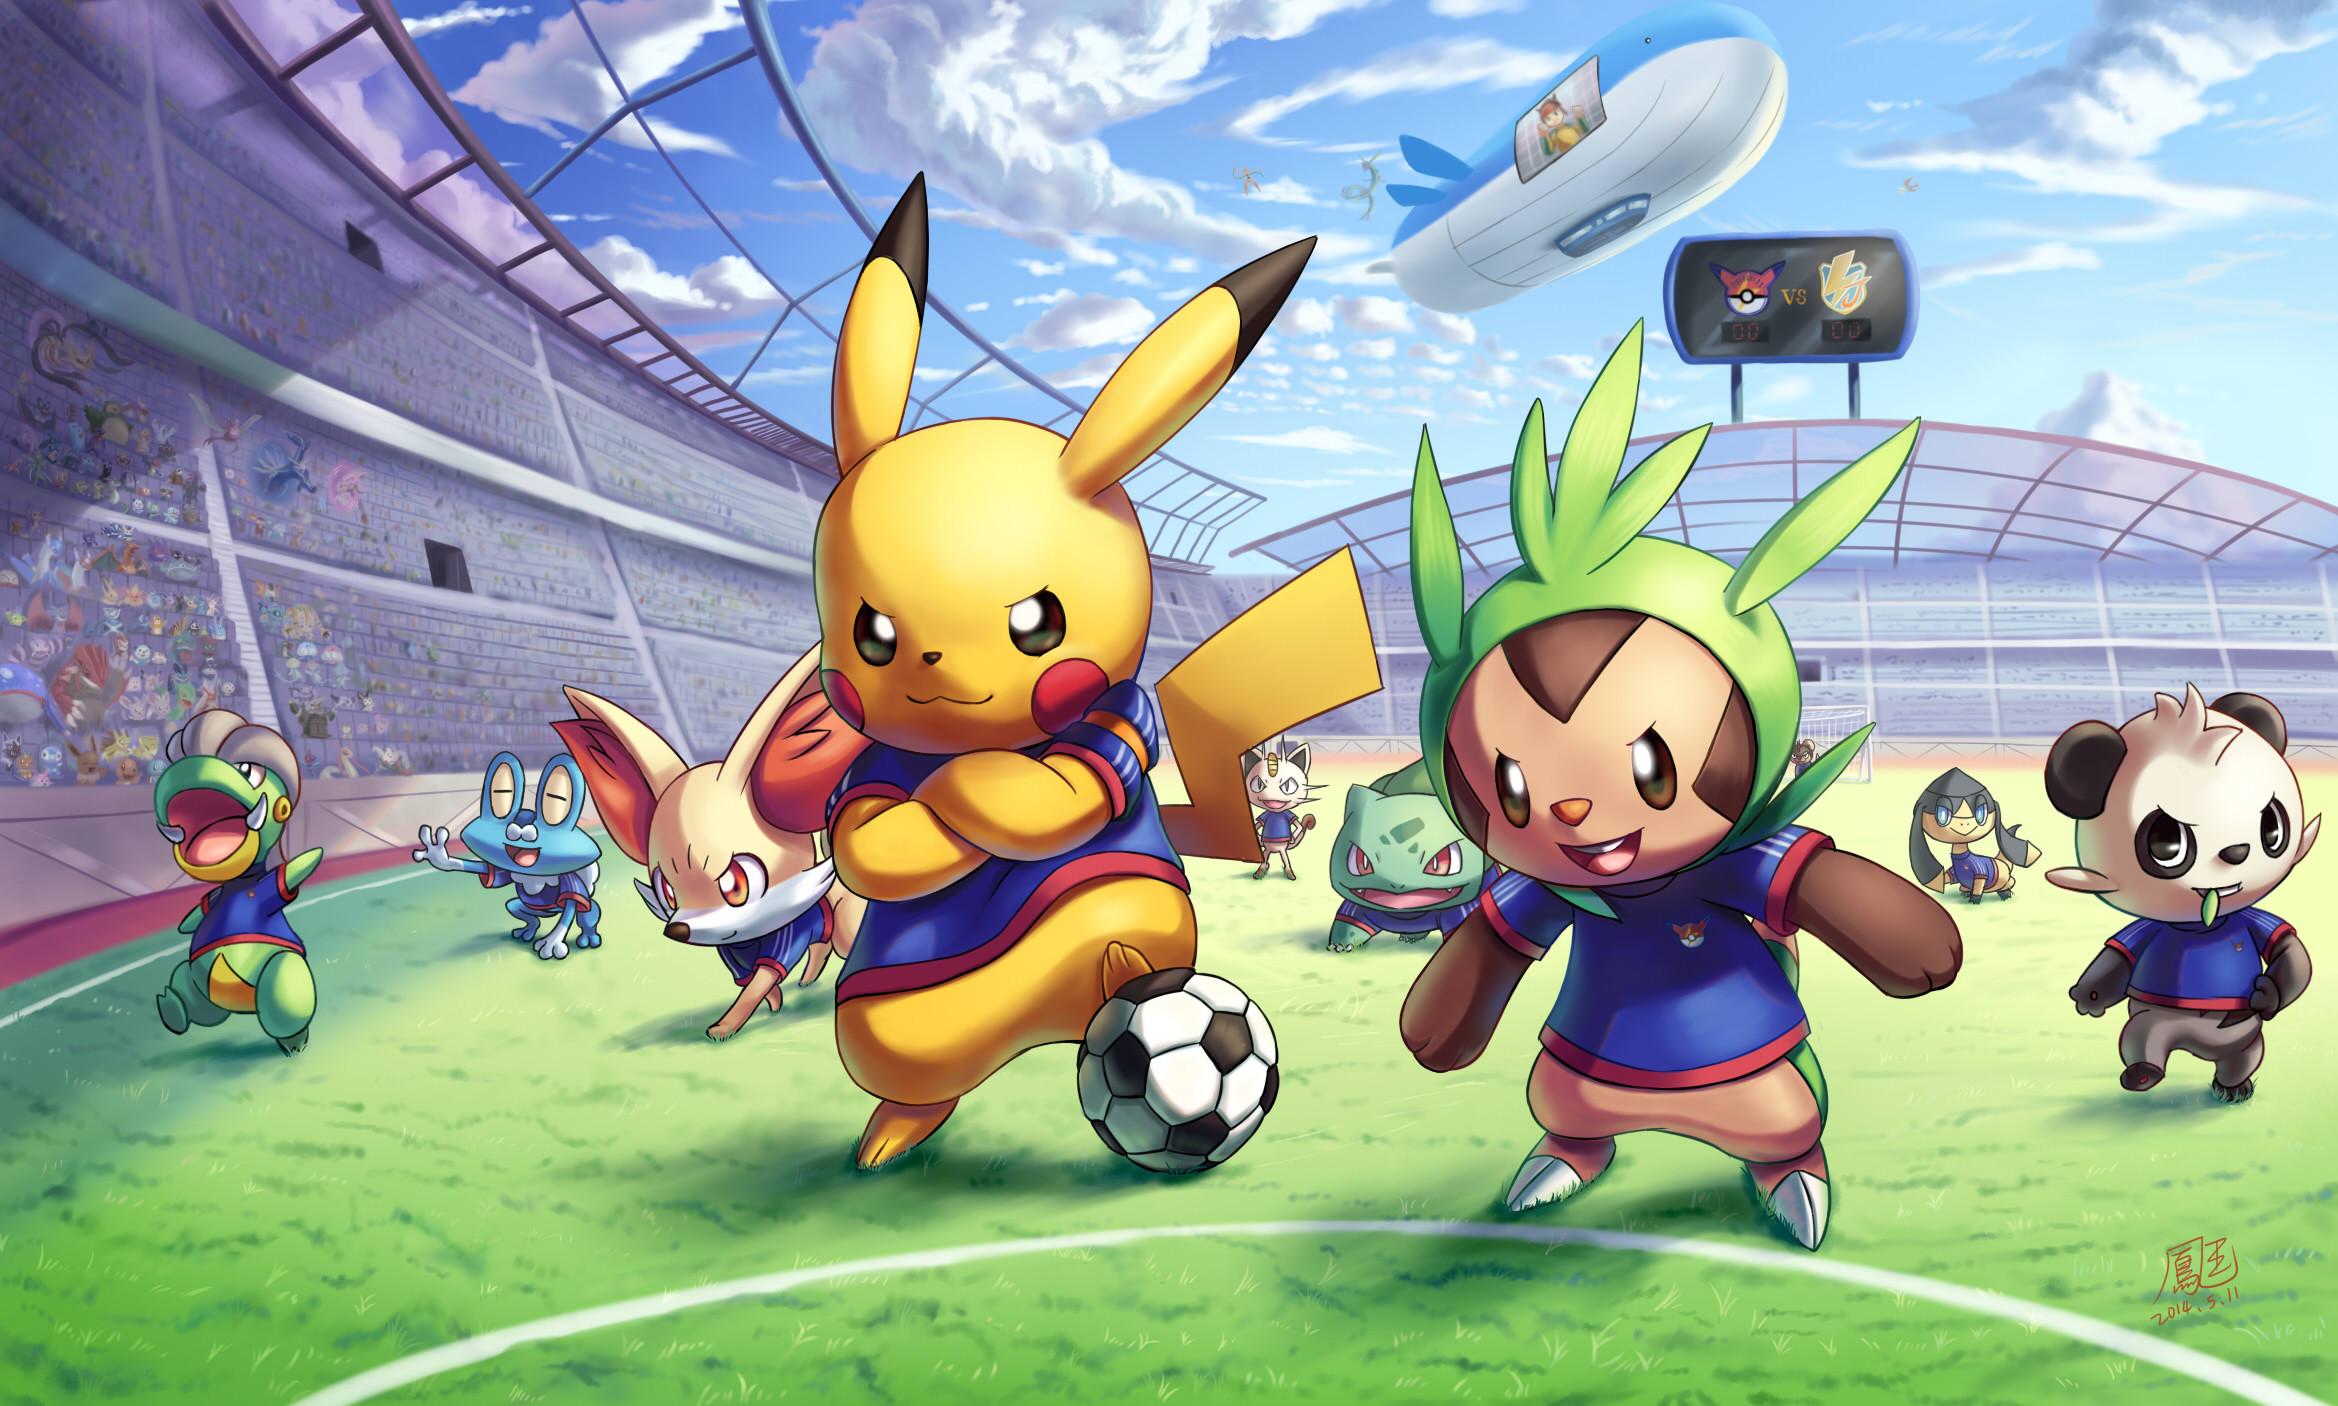 Pokemon GO Pikachu Games Cartoon Football Computer Wallpaper Ball